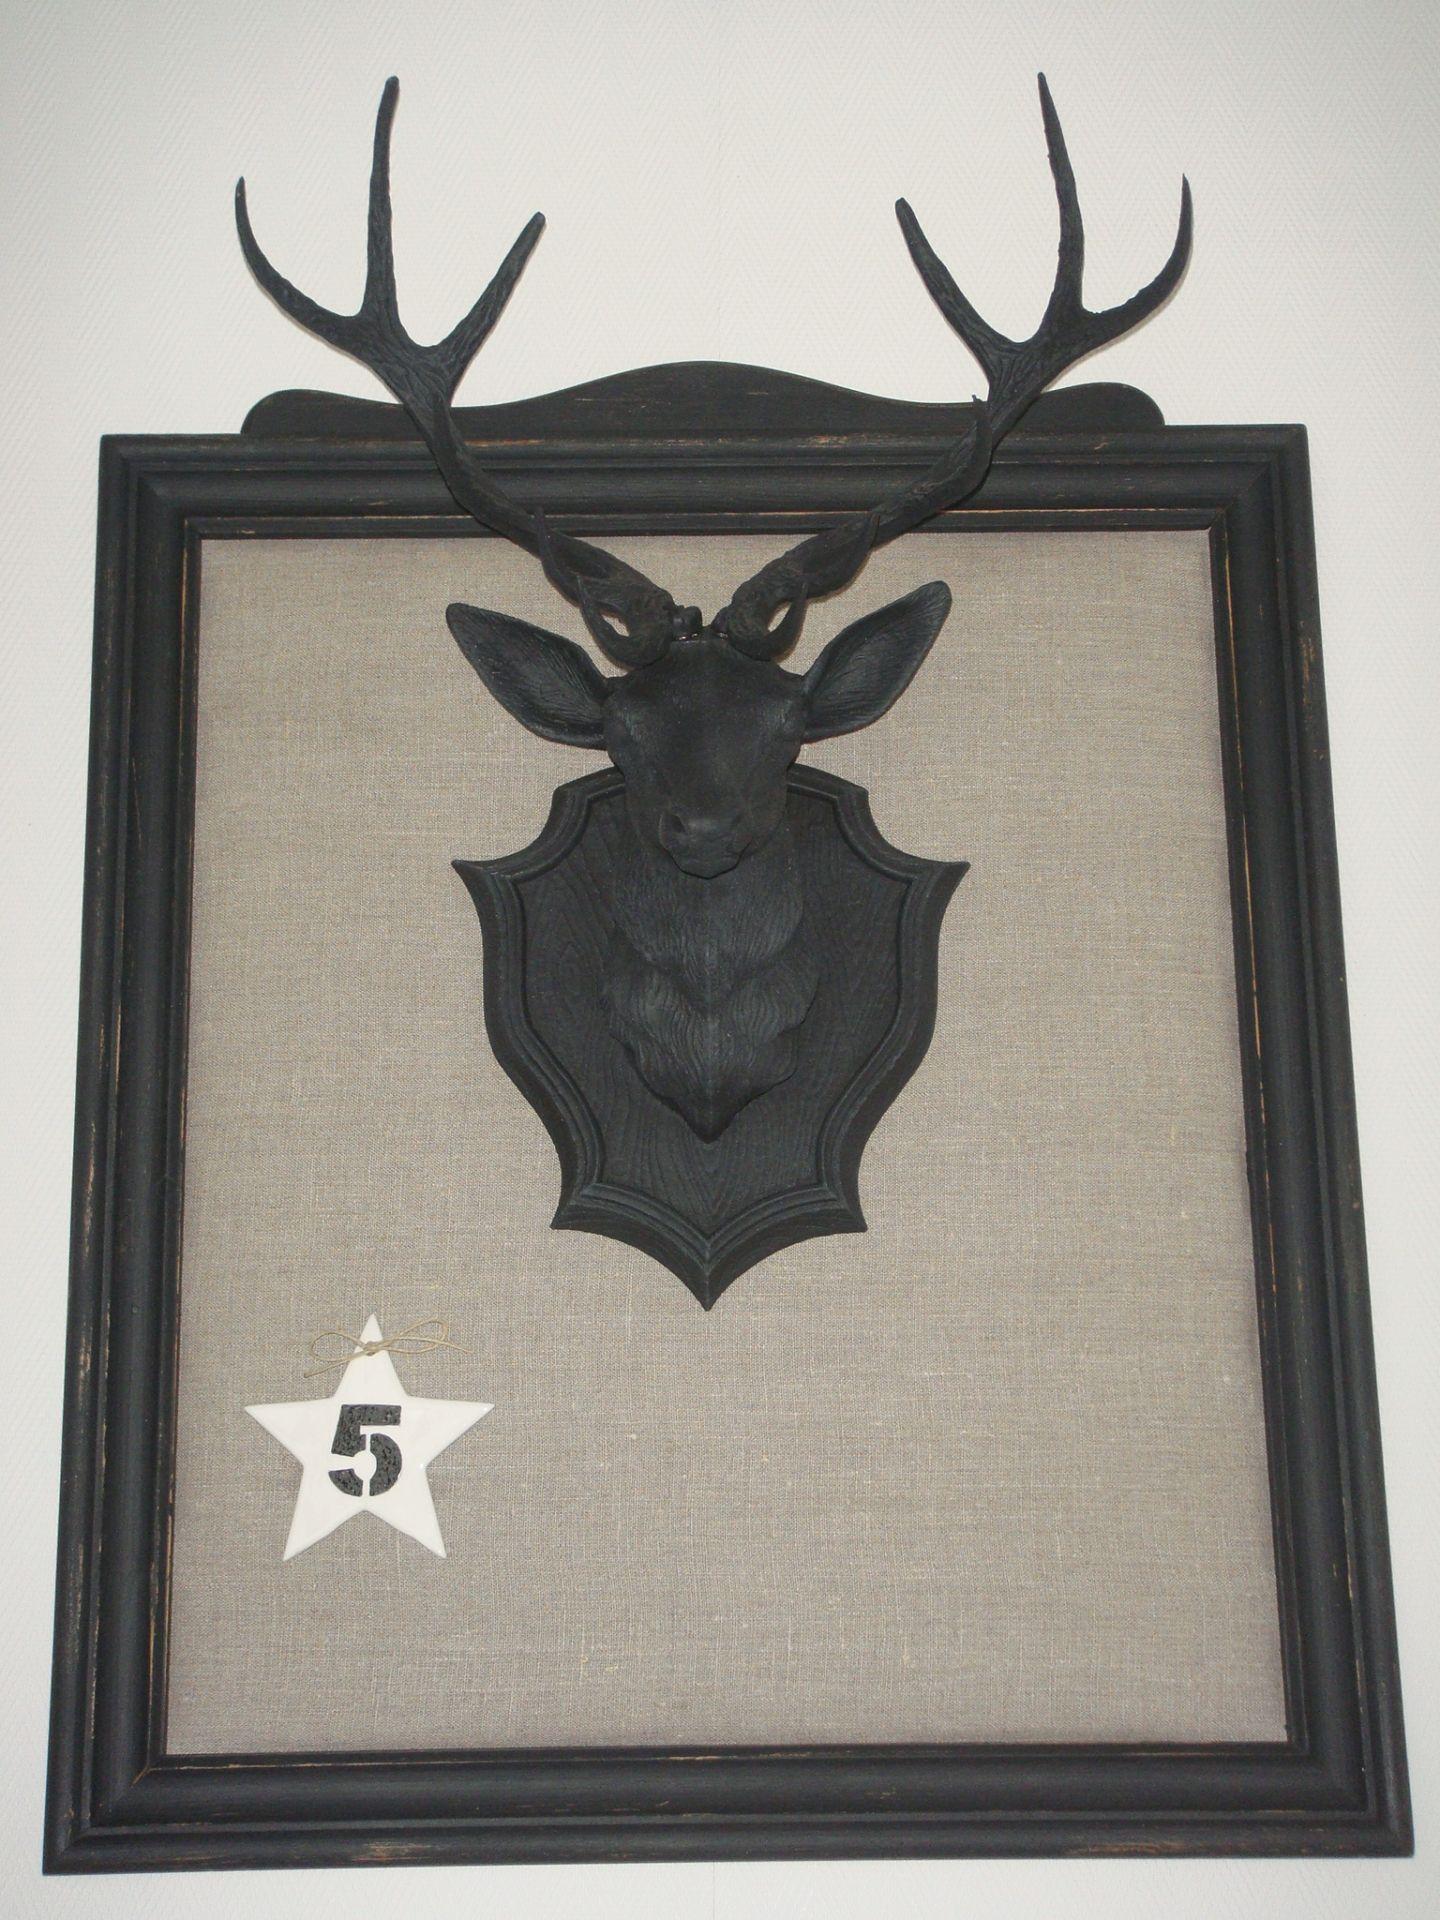 cadre style industriel tendu de lin avec troph e de cerf. Black Bedroom Furniture Sets. Home Design Ideas